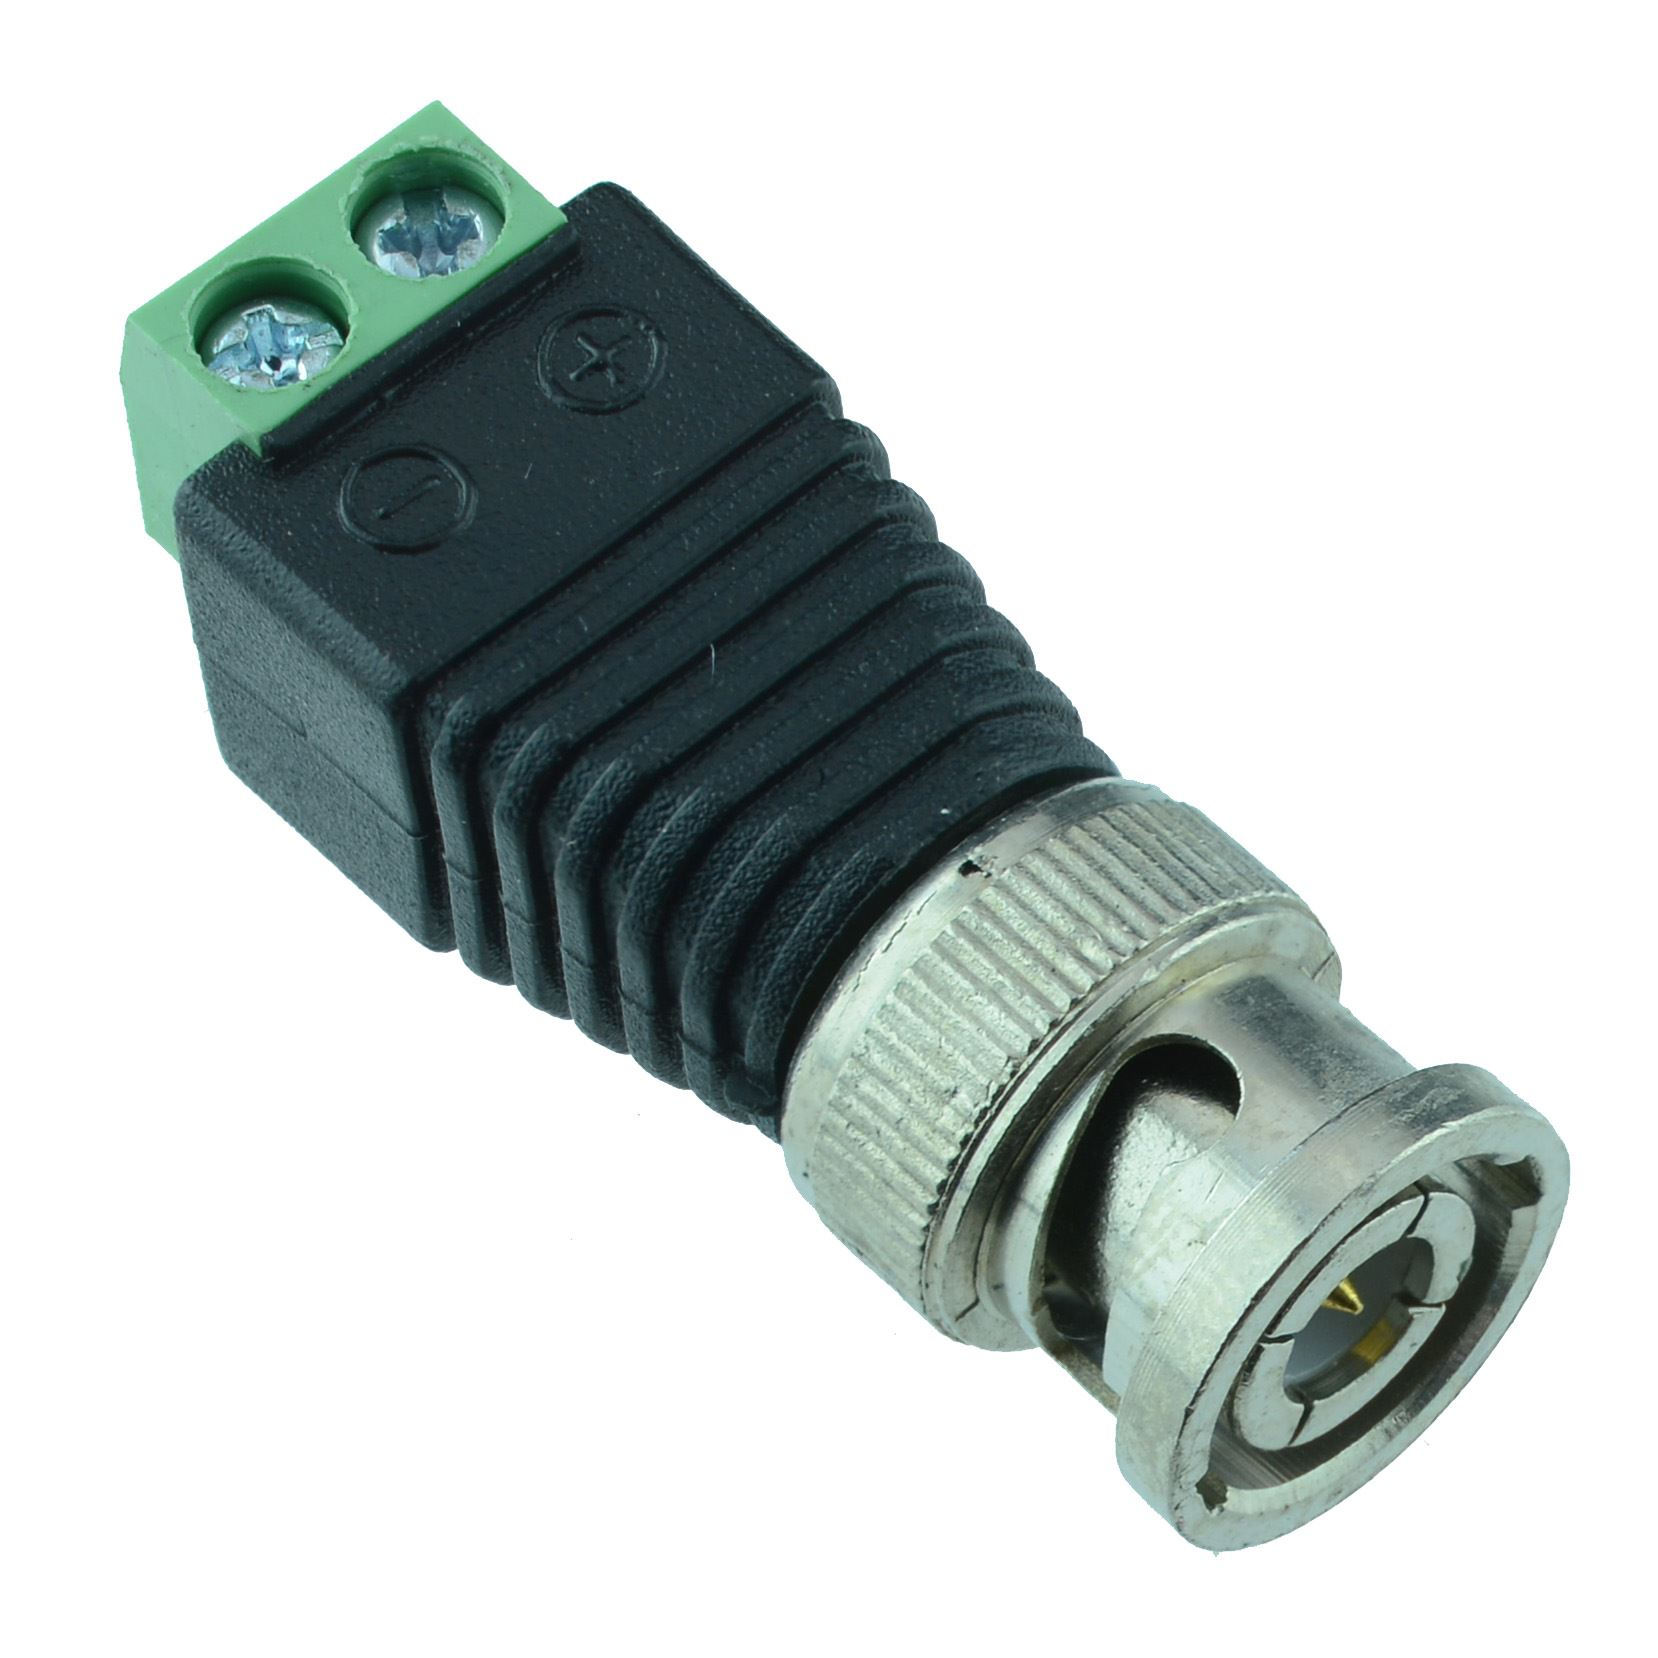 Bnc Plug Socket Coaxial Connector With Screw Terminals Ebay Rg58 Cable Schematics